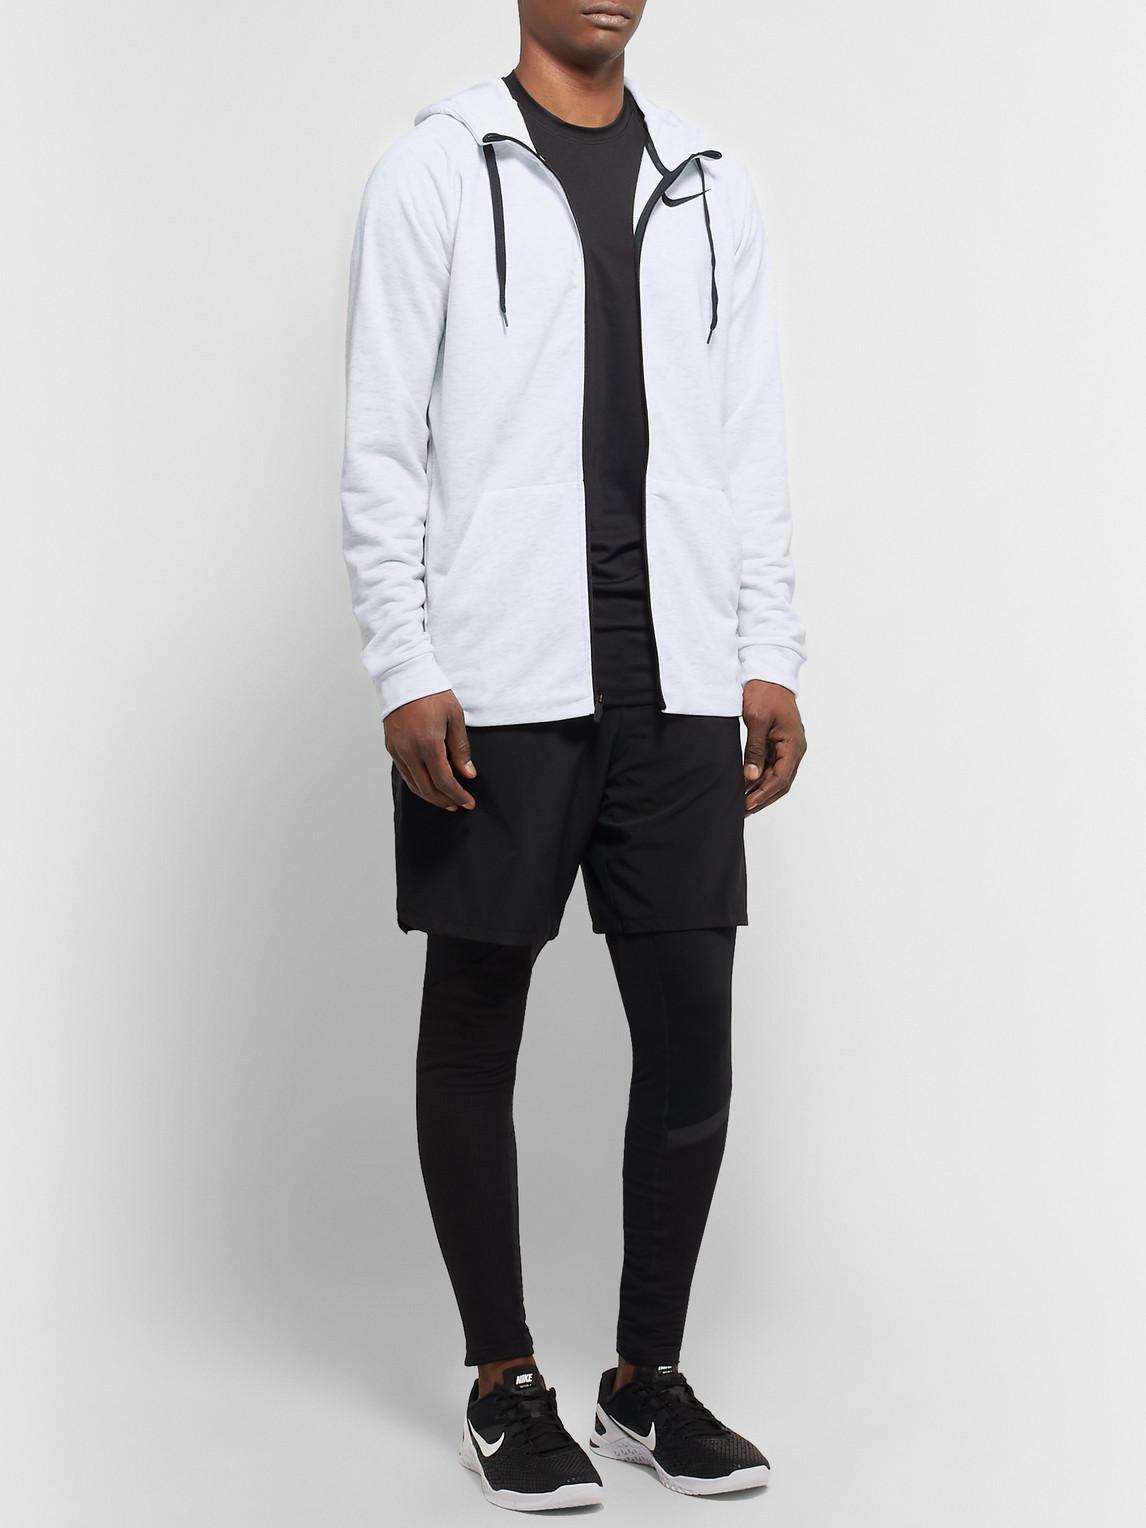 Nike Tops MÉLANGE LOOPBACK DRI